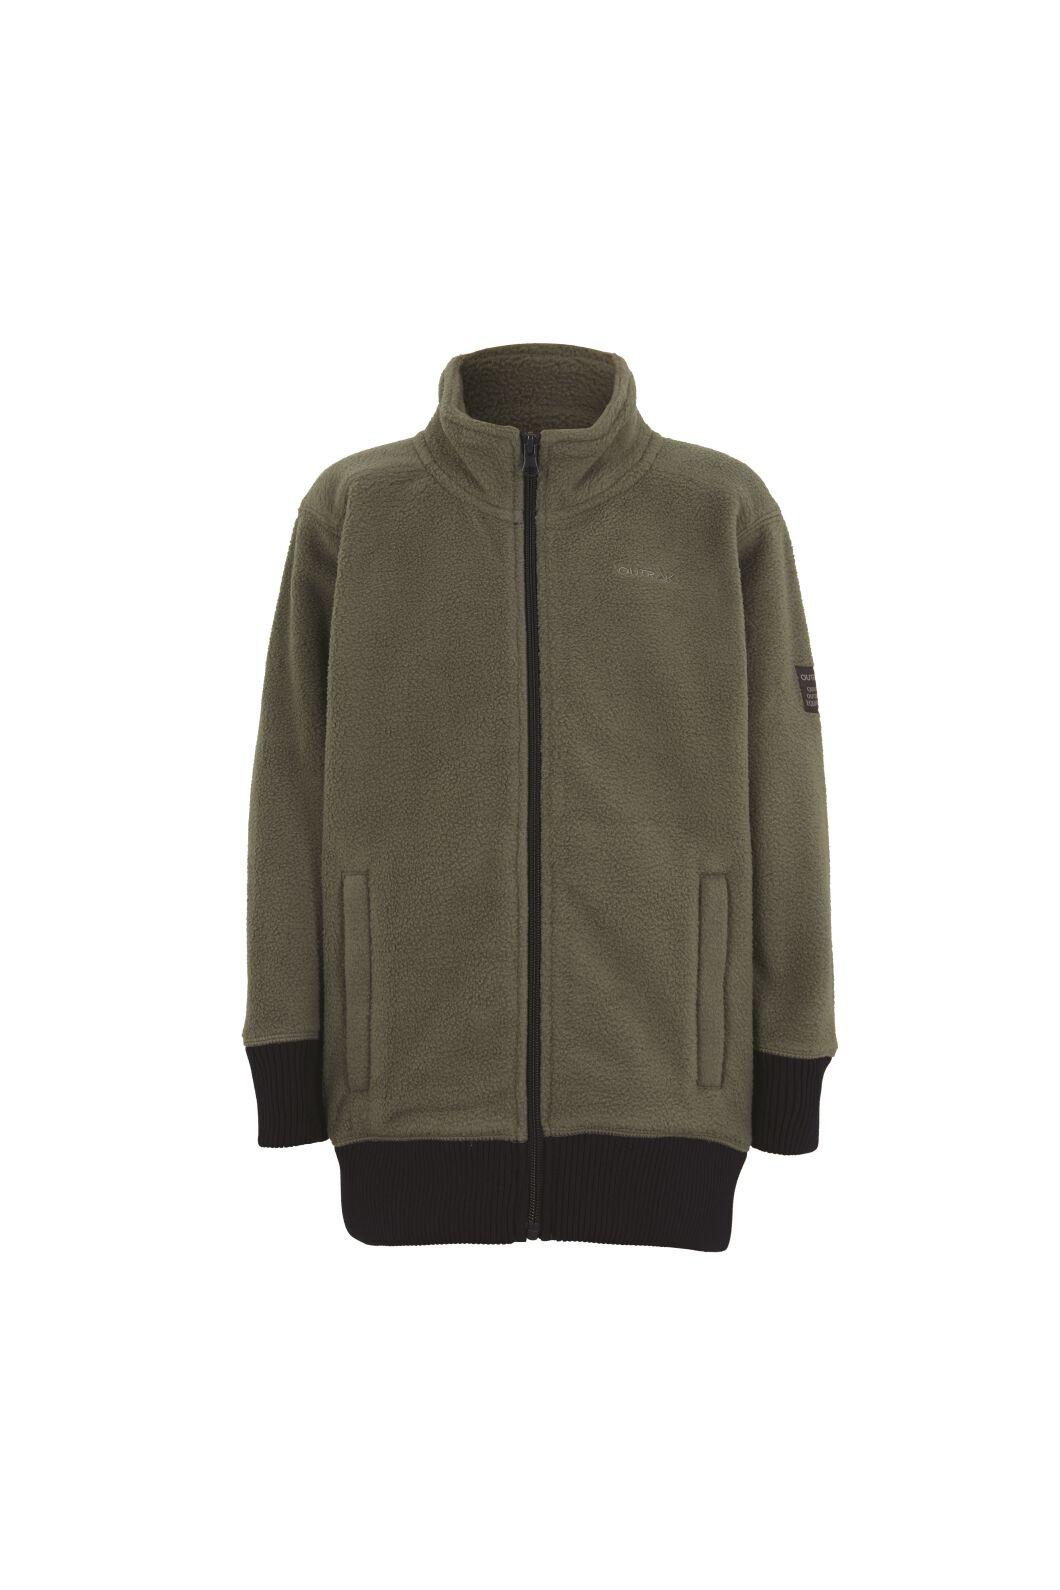 Outrak Kids' Yak Fleece Jacket, Green, hi-res